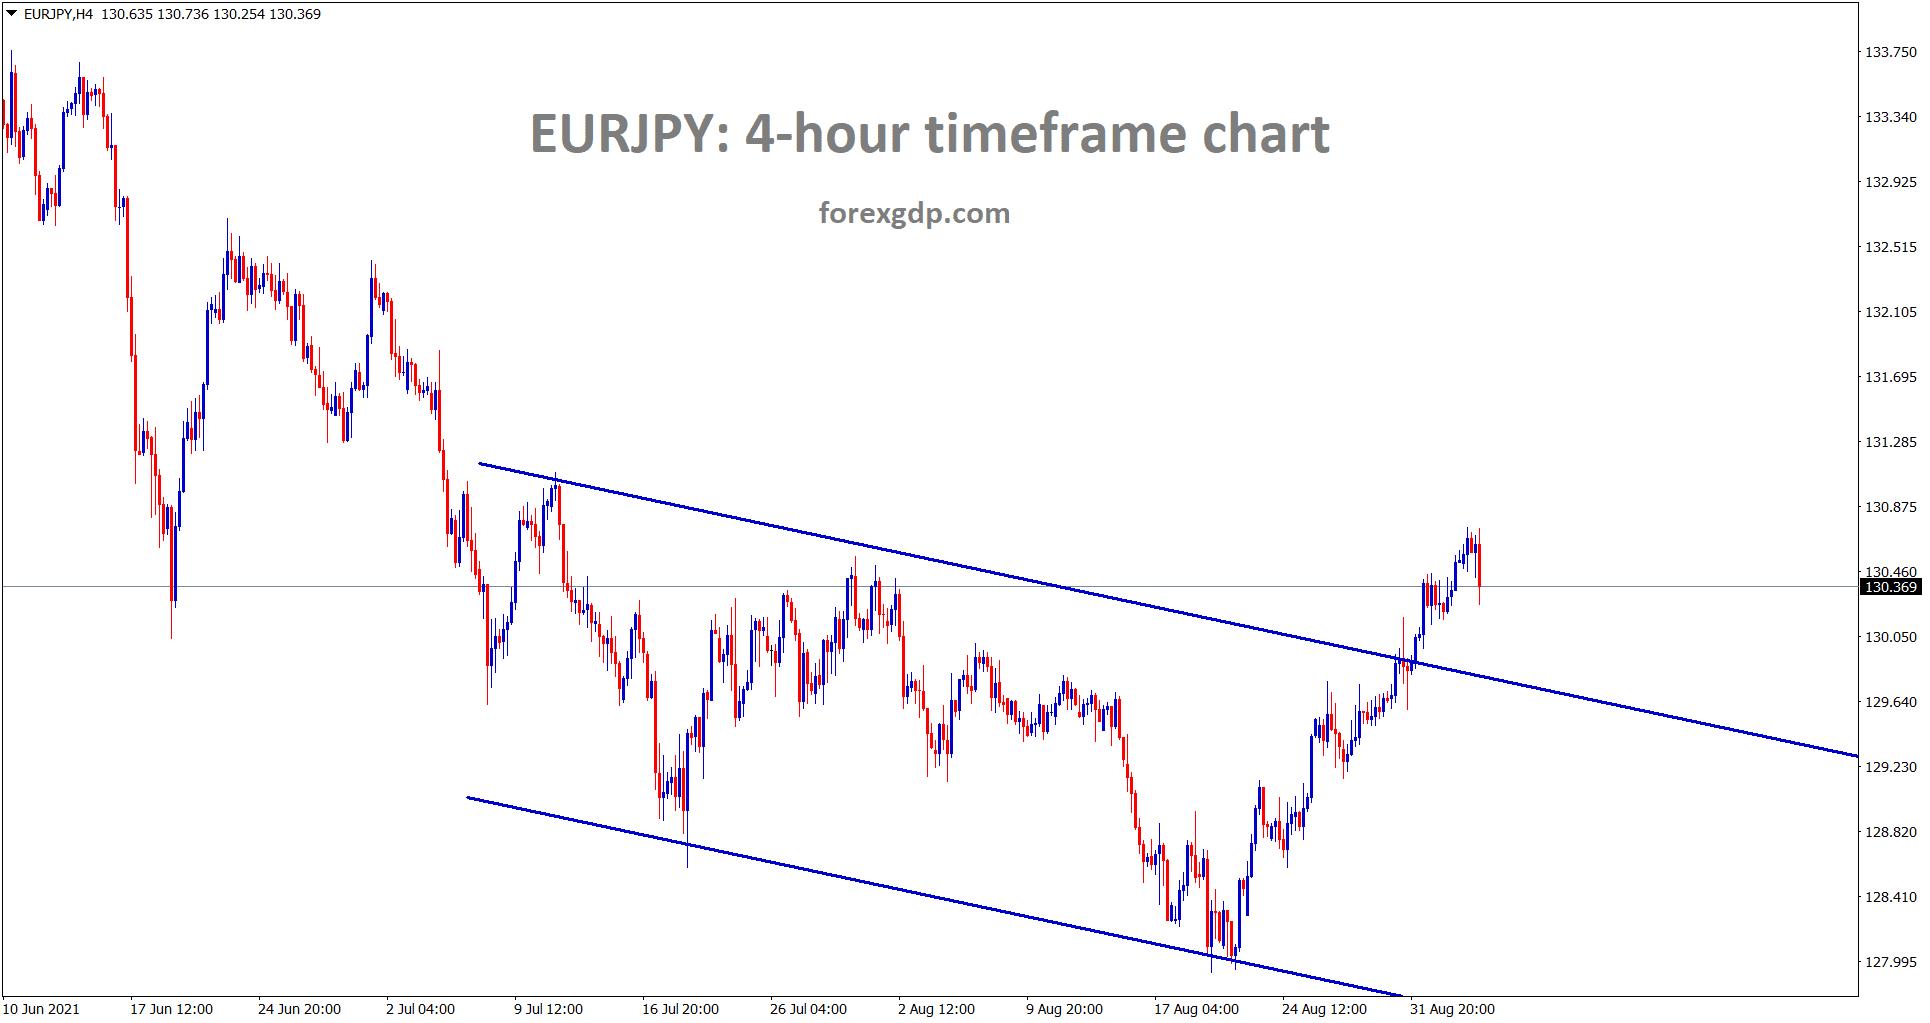 EURJPY have chances to retest the broken descending channel